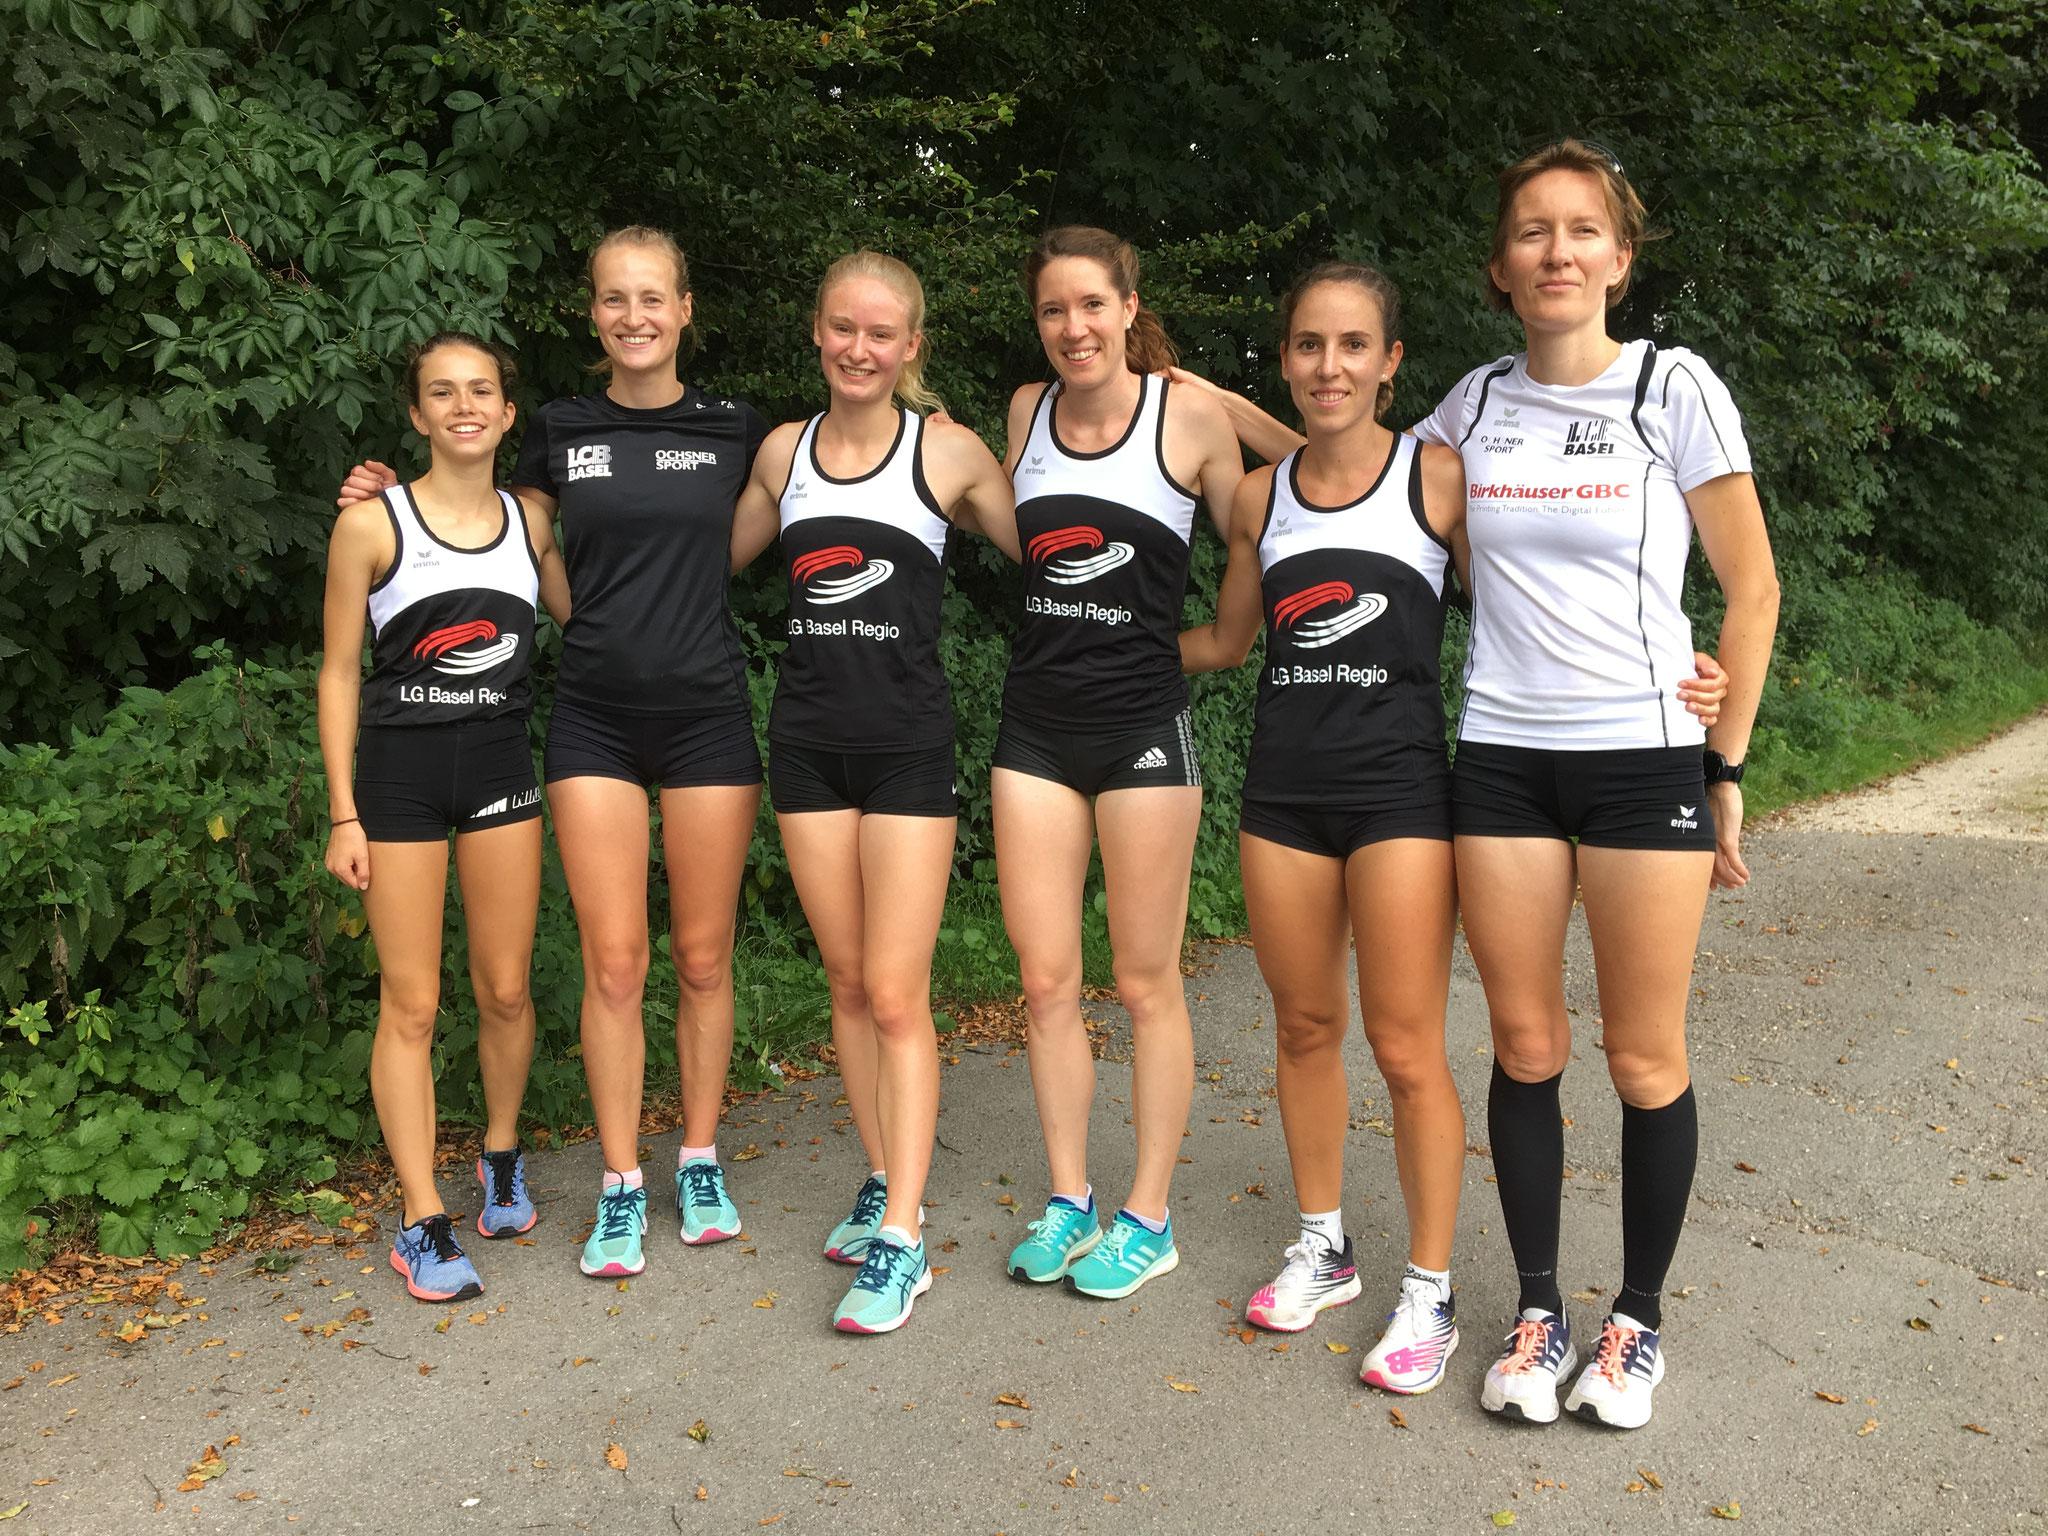 (v.li.n.re) Claudia Cook; Christina Reichelt; Katja Schmid; Priska Auf der Maur; Kathrin Ziegler; Sibylle Dürrenmatt